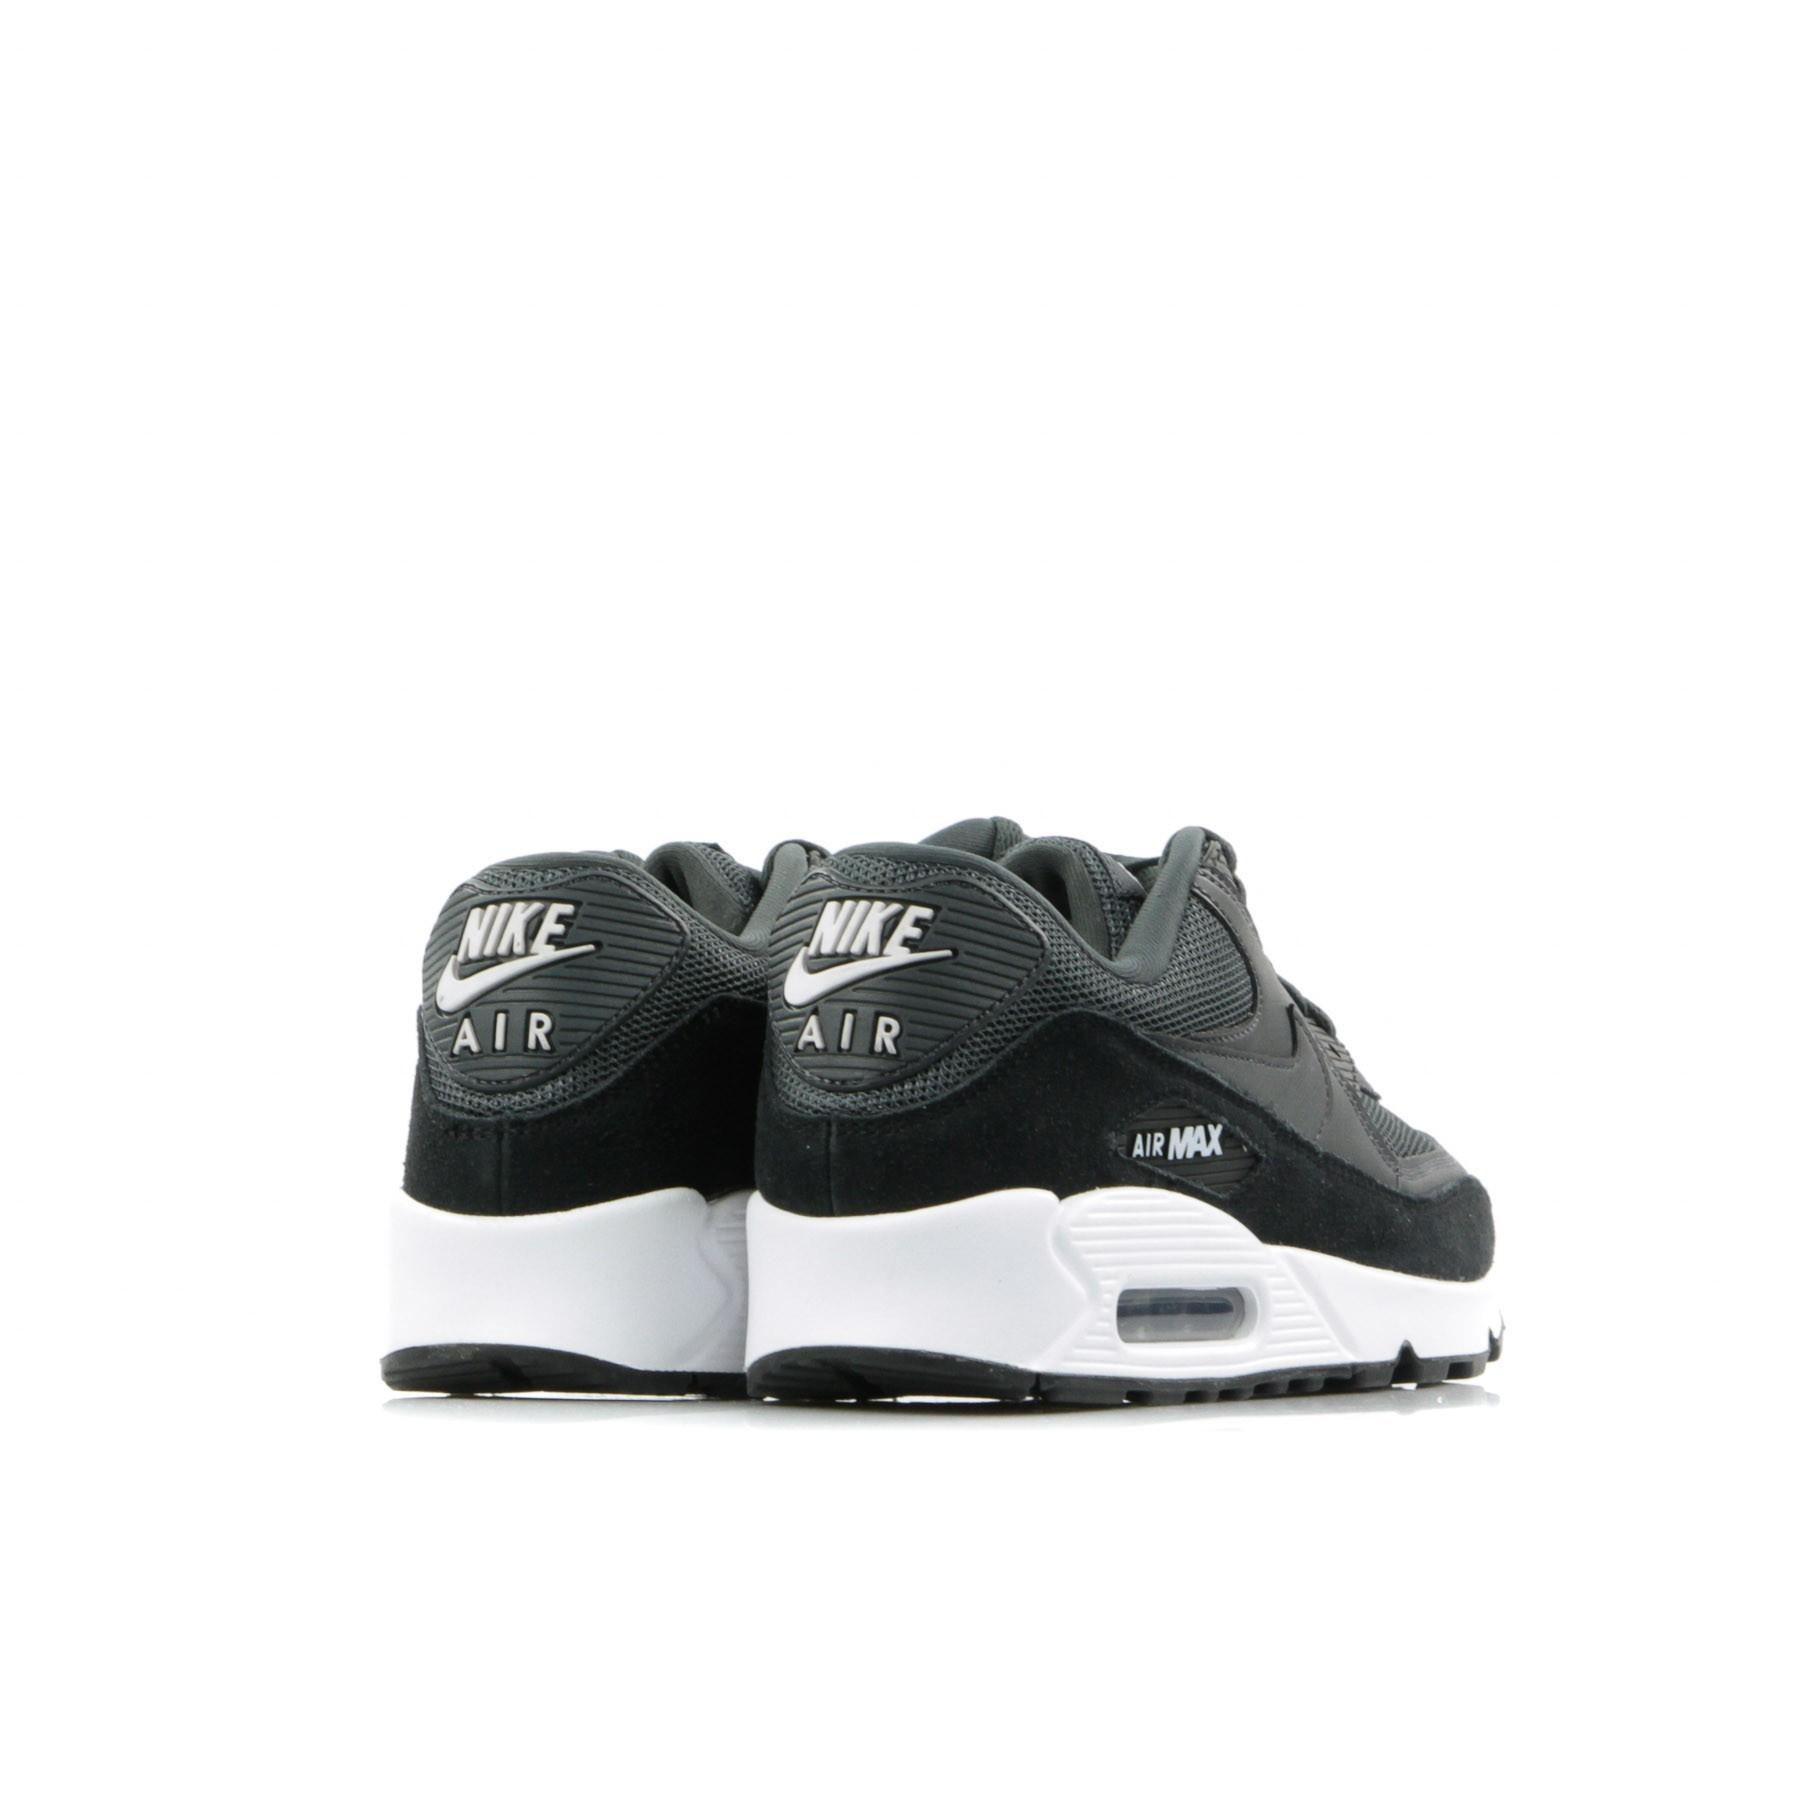 Nike Air Max 90 Ultra 2.0 Essential 875695 020 eBay